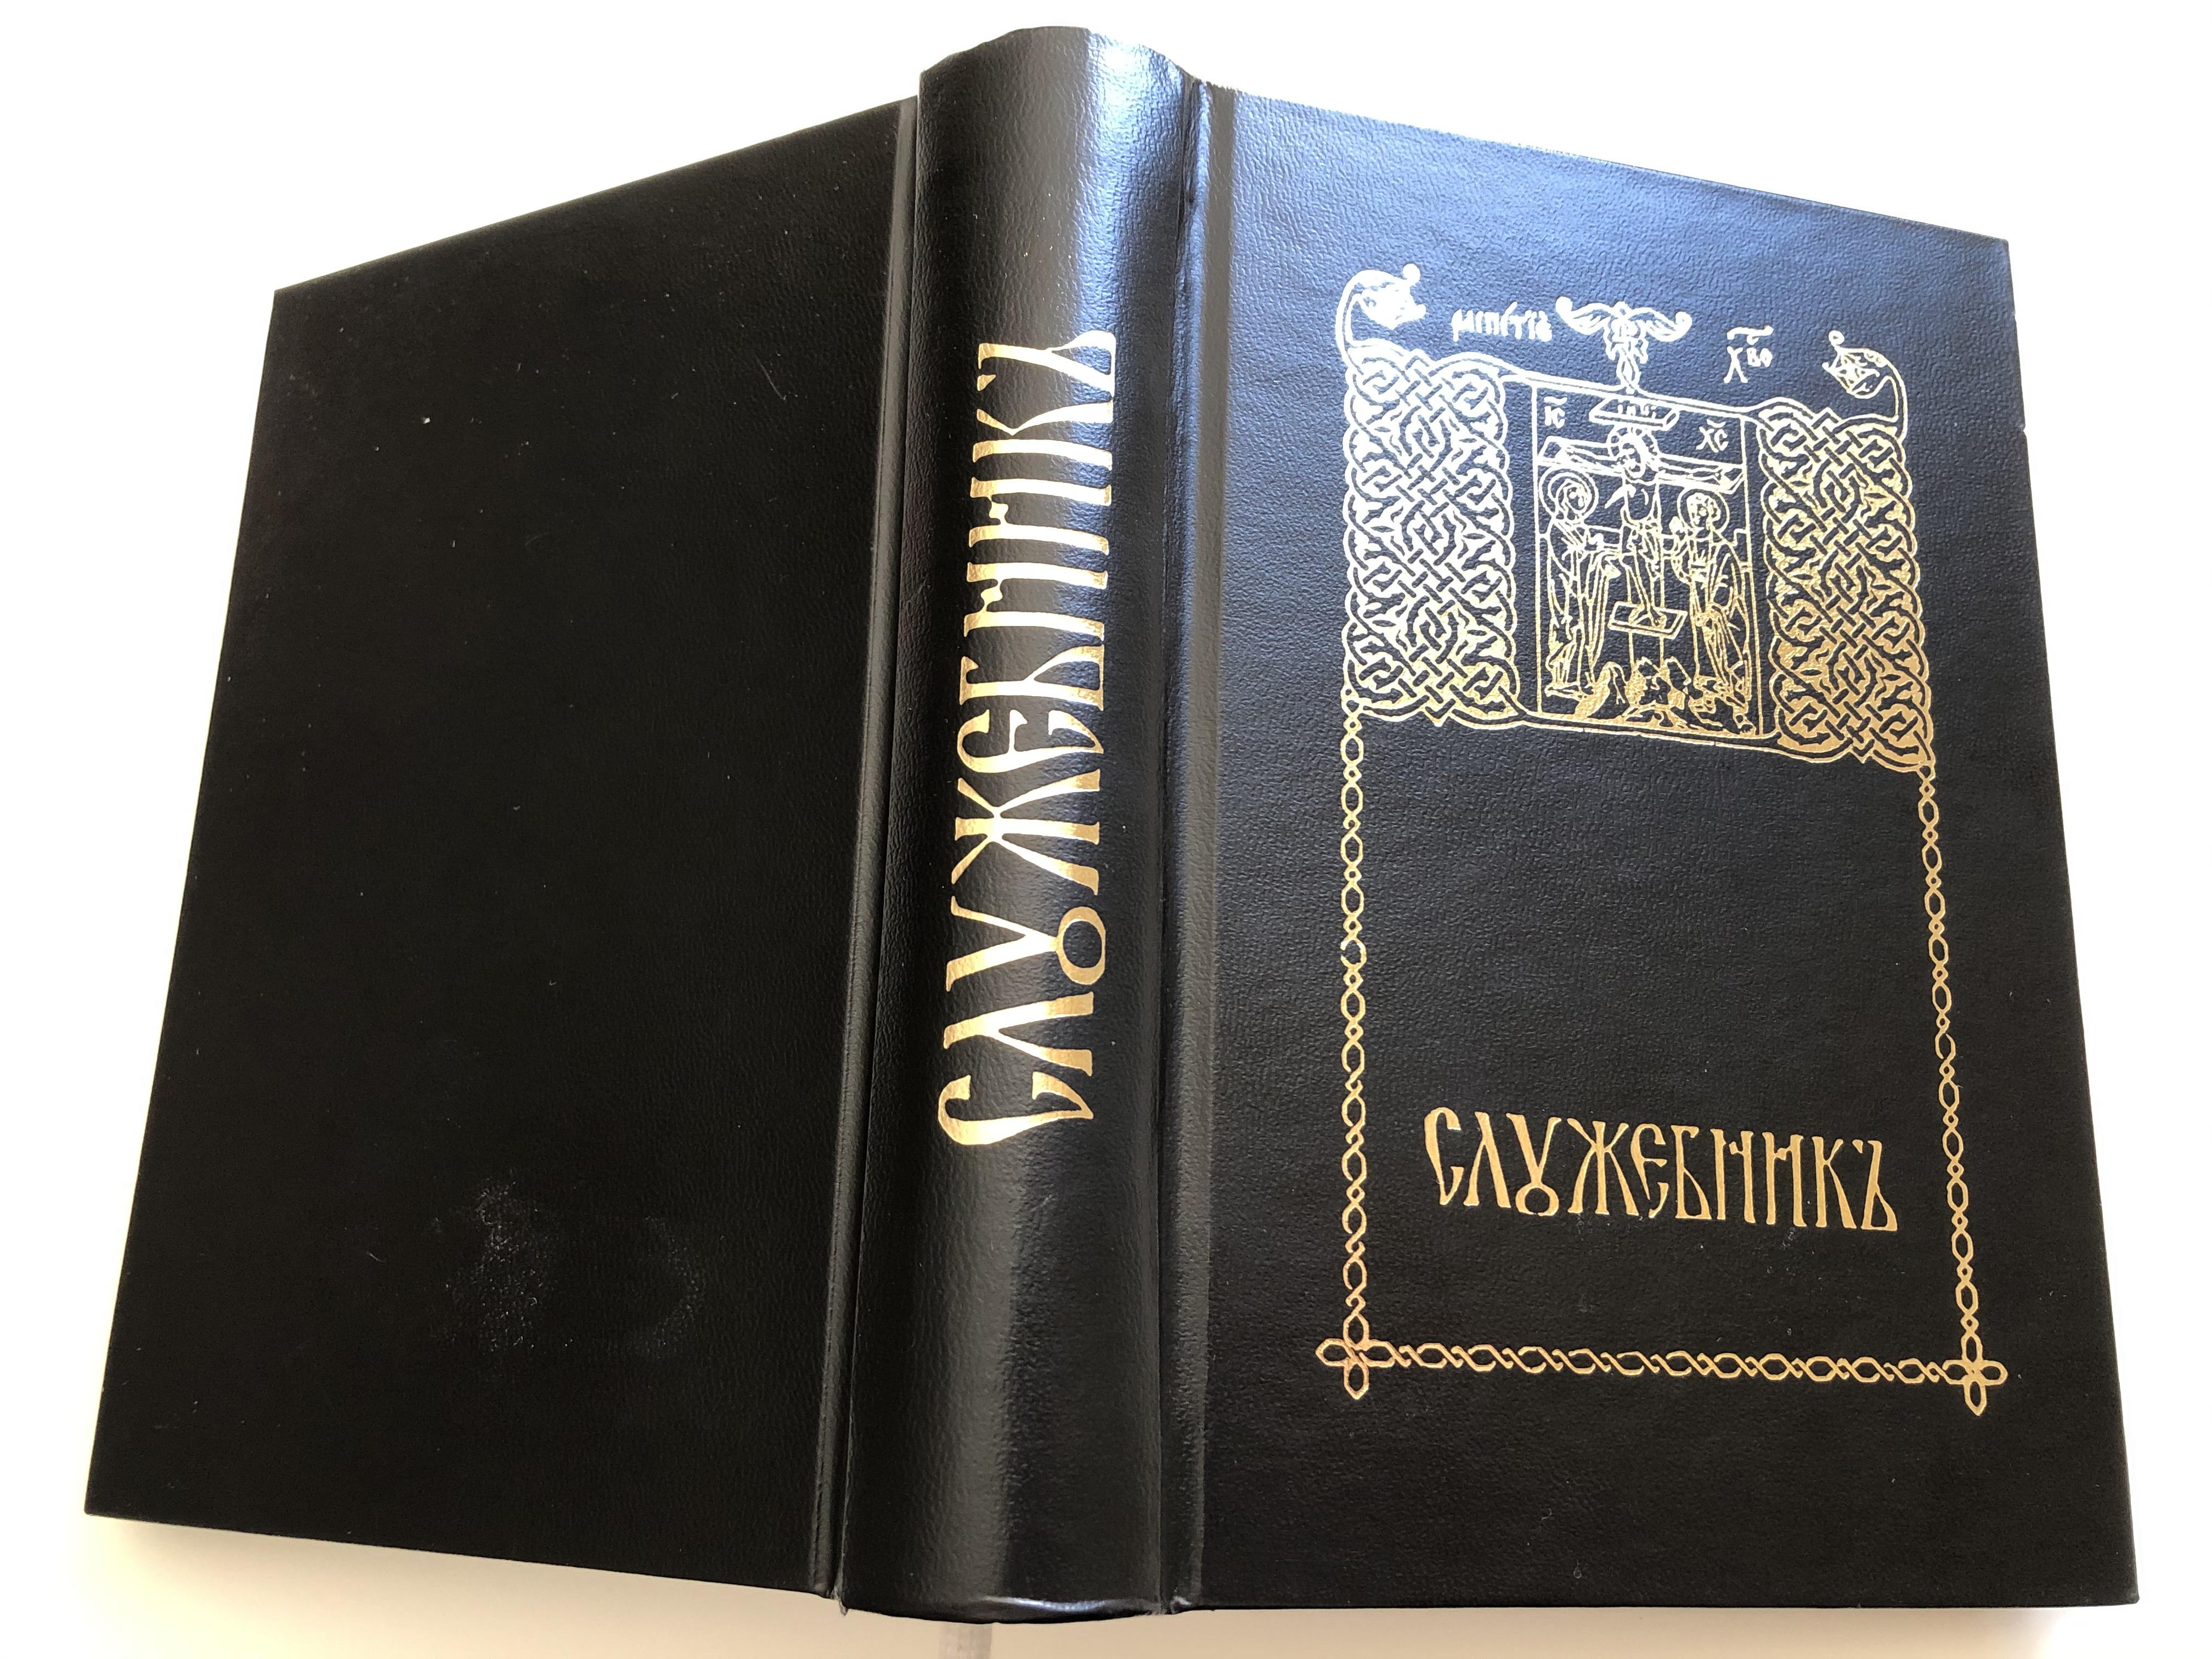 -serbian-orthodox-liturgical-texts-in-church-slavonic-2.jpg